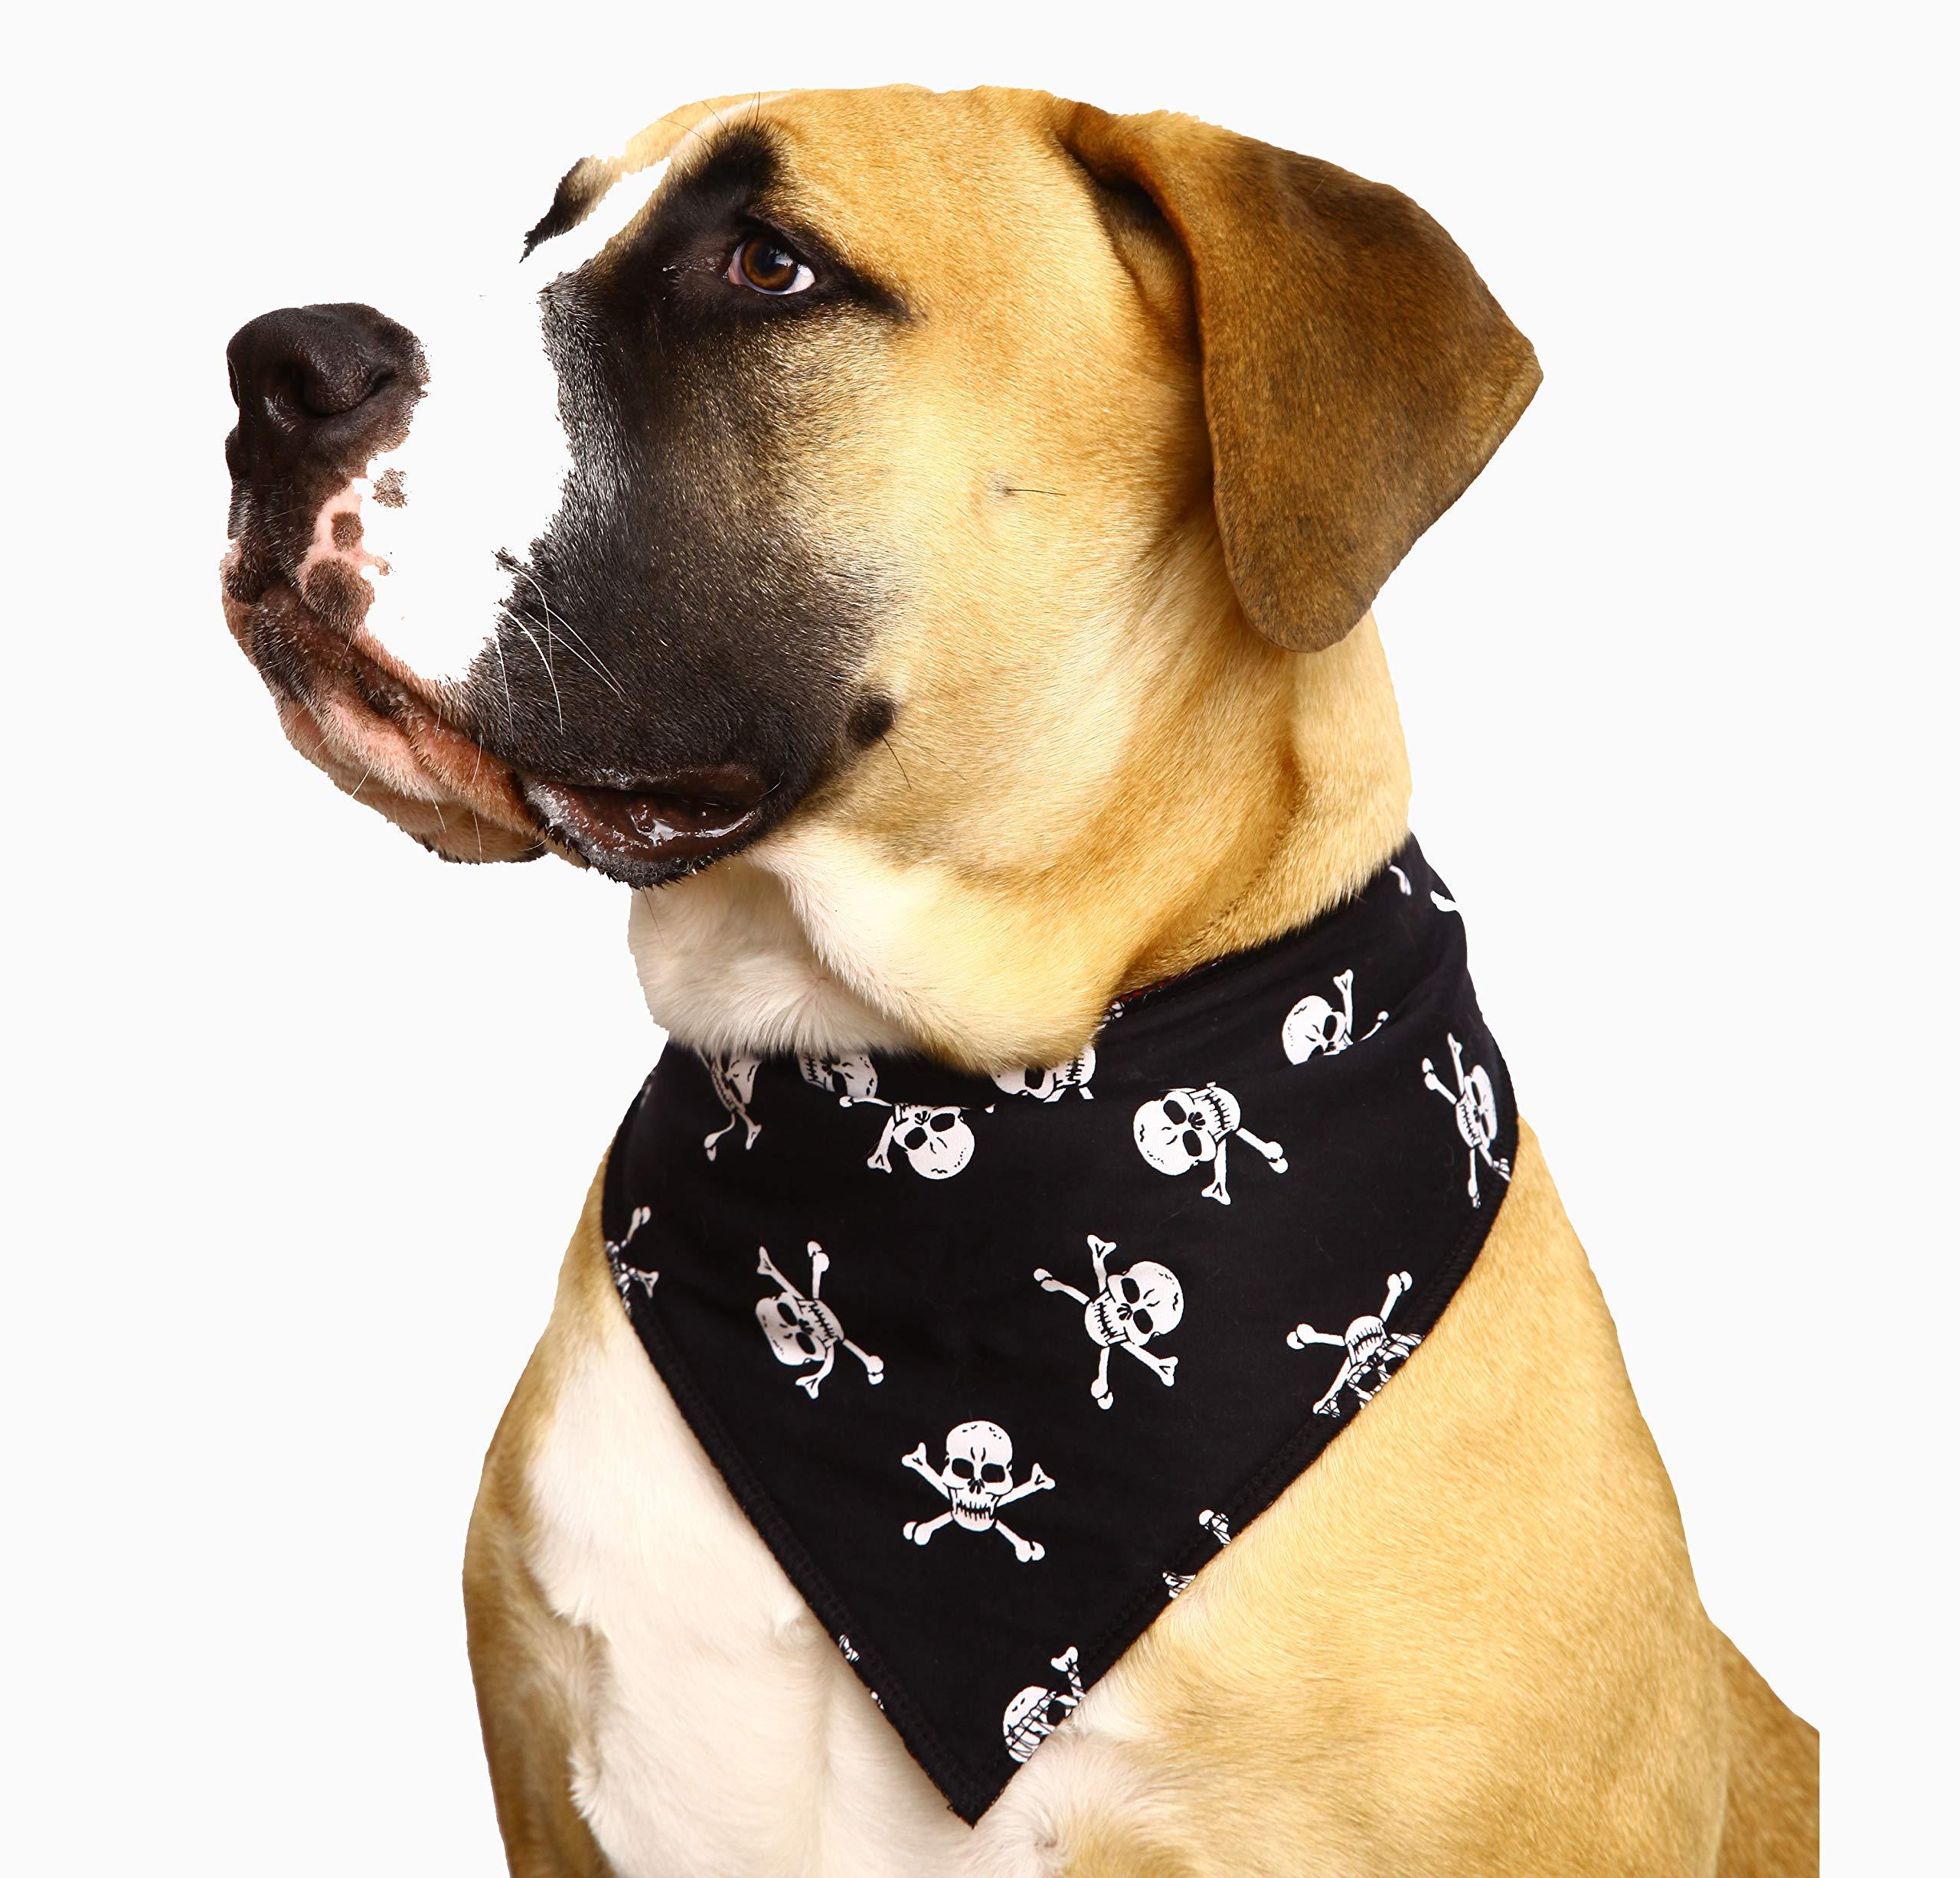 Spoilt Rotten Pets Dog Bandana S4 White Skulls, Jolly Roger, Dog Bandana. Generally Fits Chow Chow, German Shepherd, St Bernard, Dogue de Bordeaux and Similar Sized Dogs.